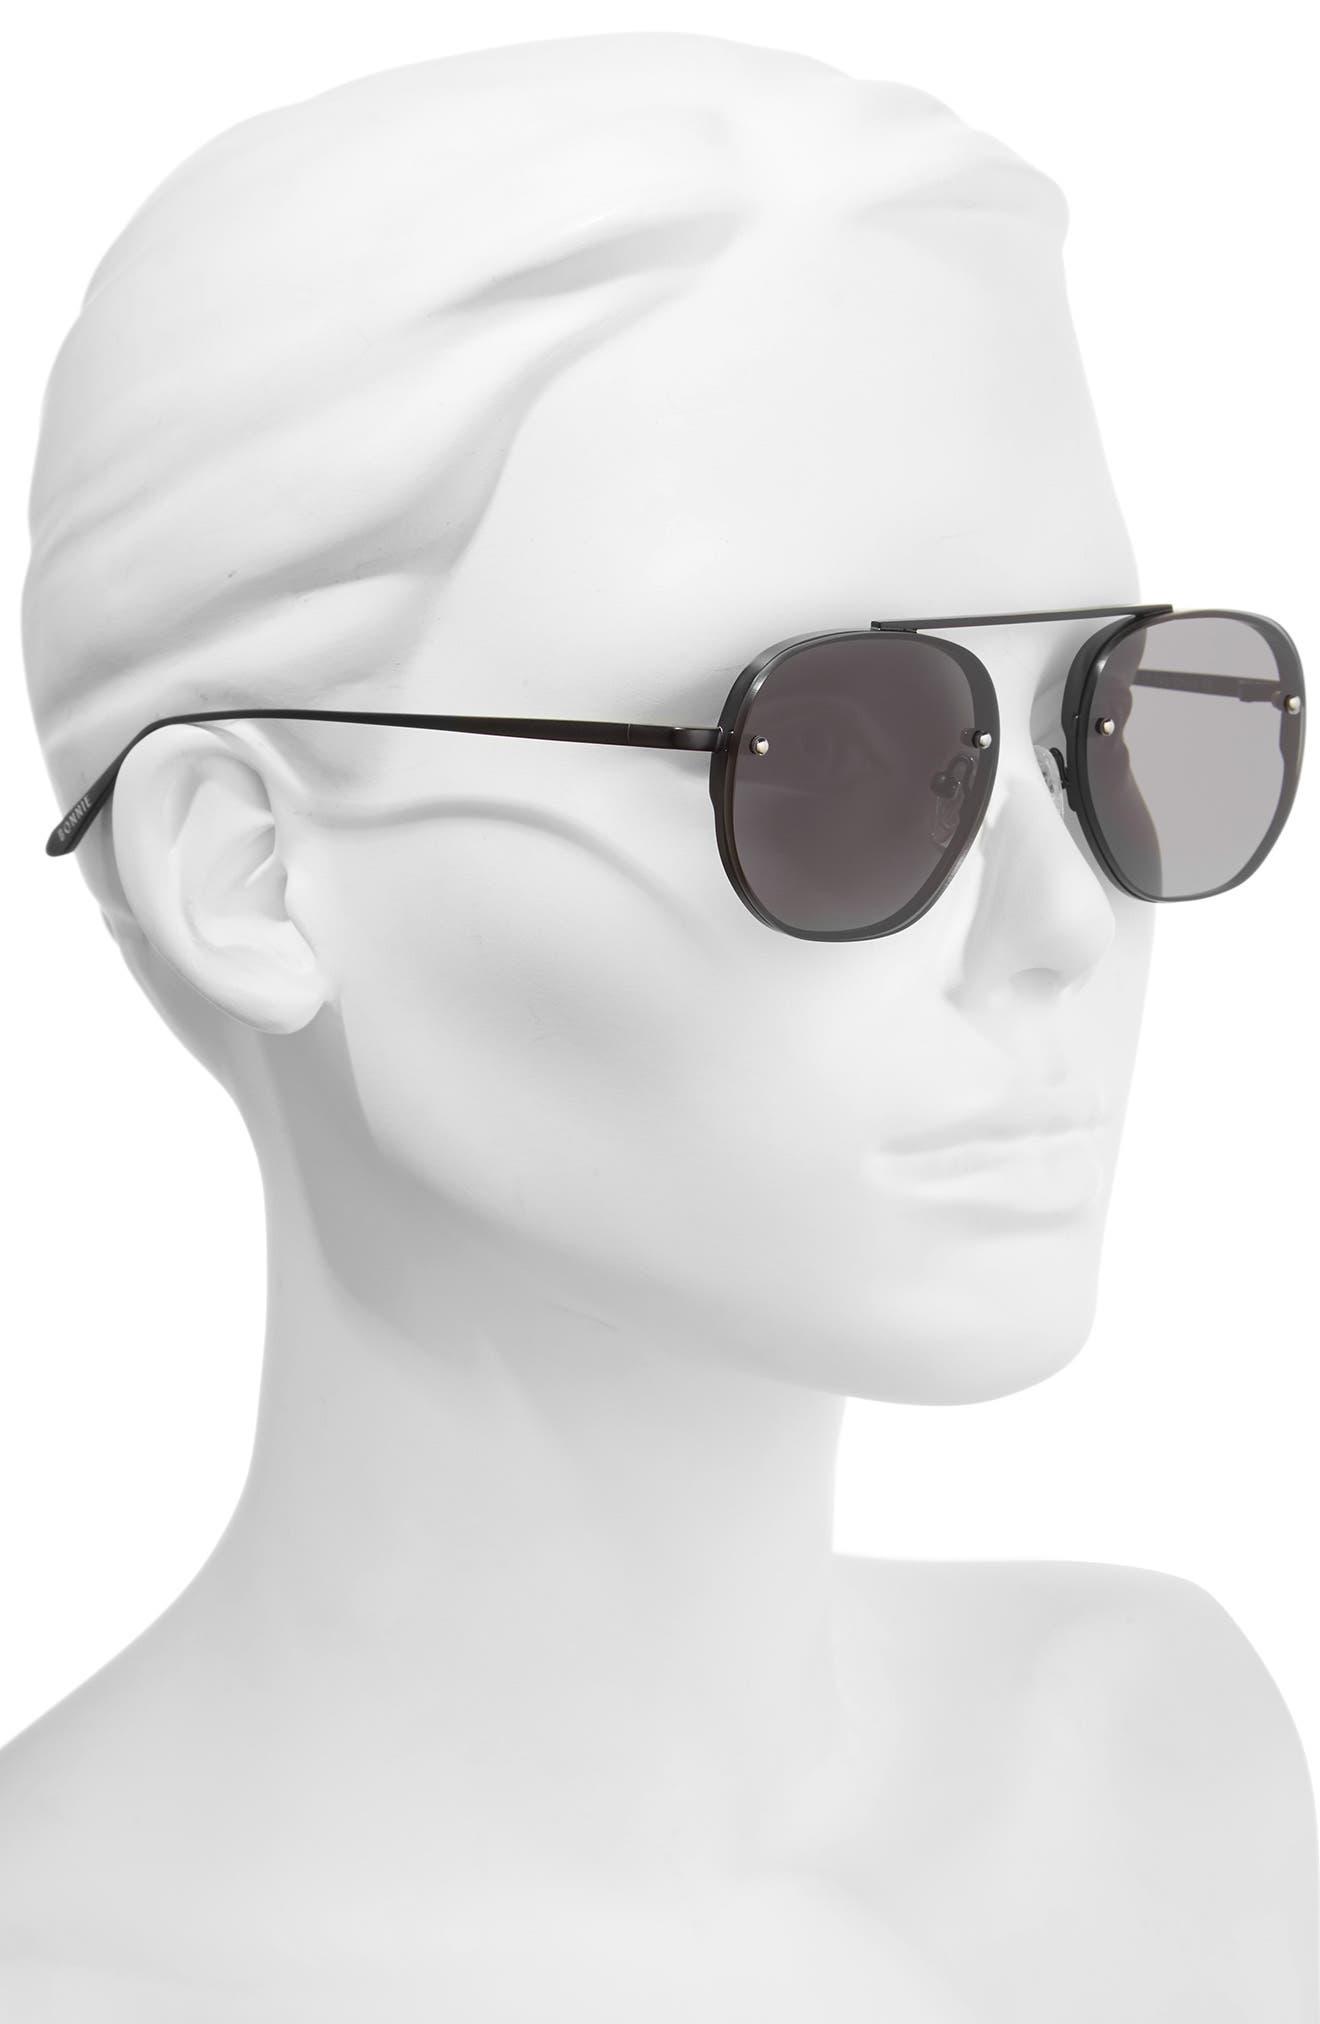 Traction 52mm Aviator Sunglasses,                             Alternate thumbnail 3, color,                             Gravity Black